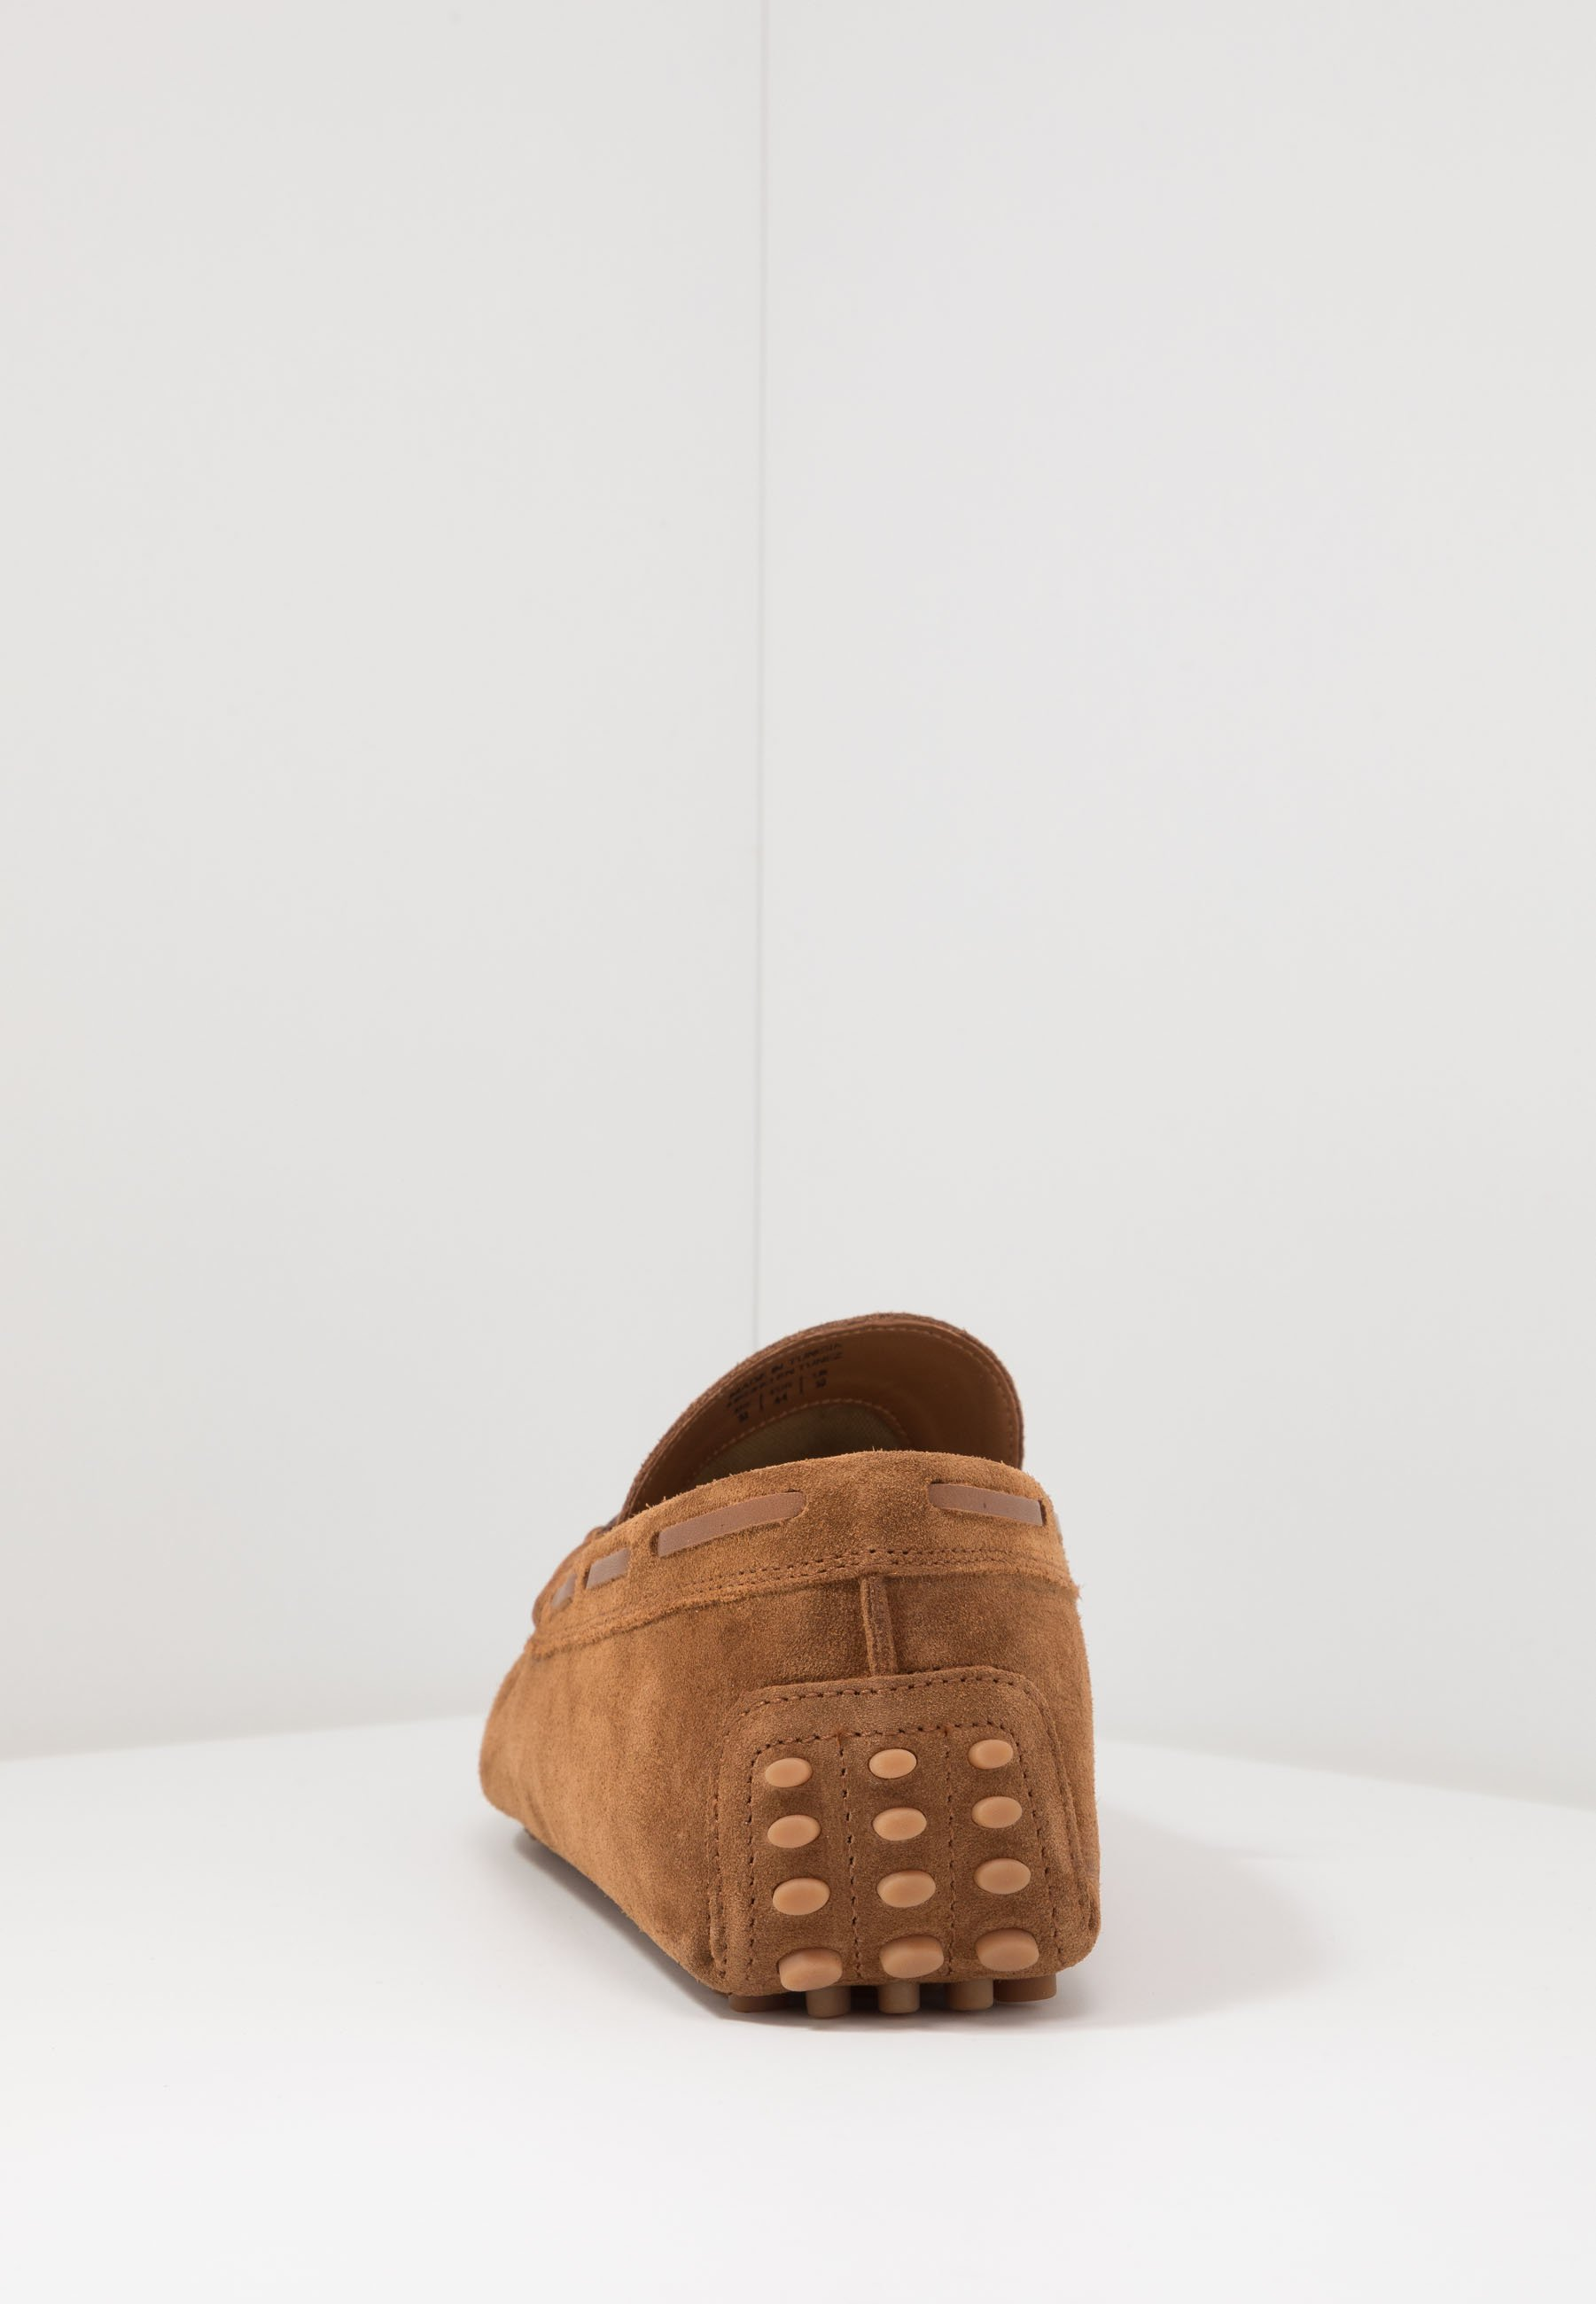 Aldo Roxbury - Moccasins Other Brown